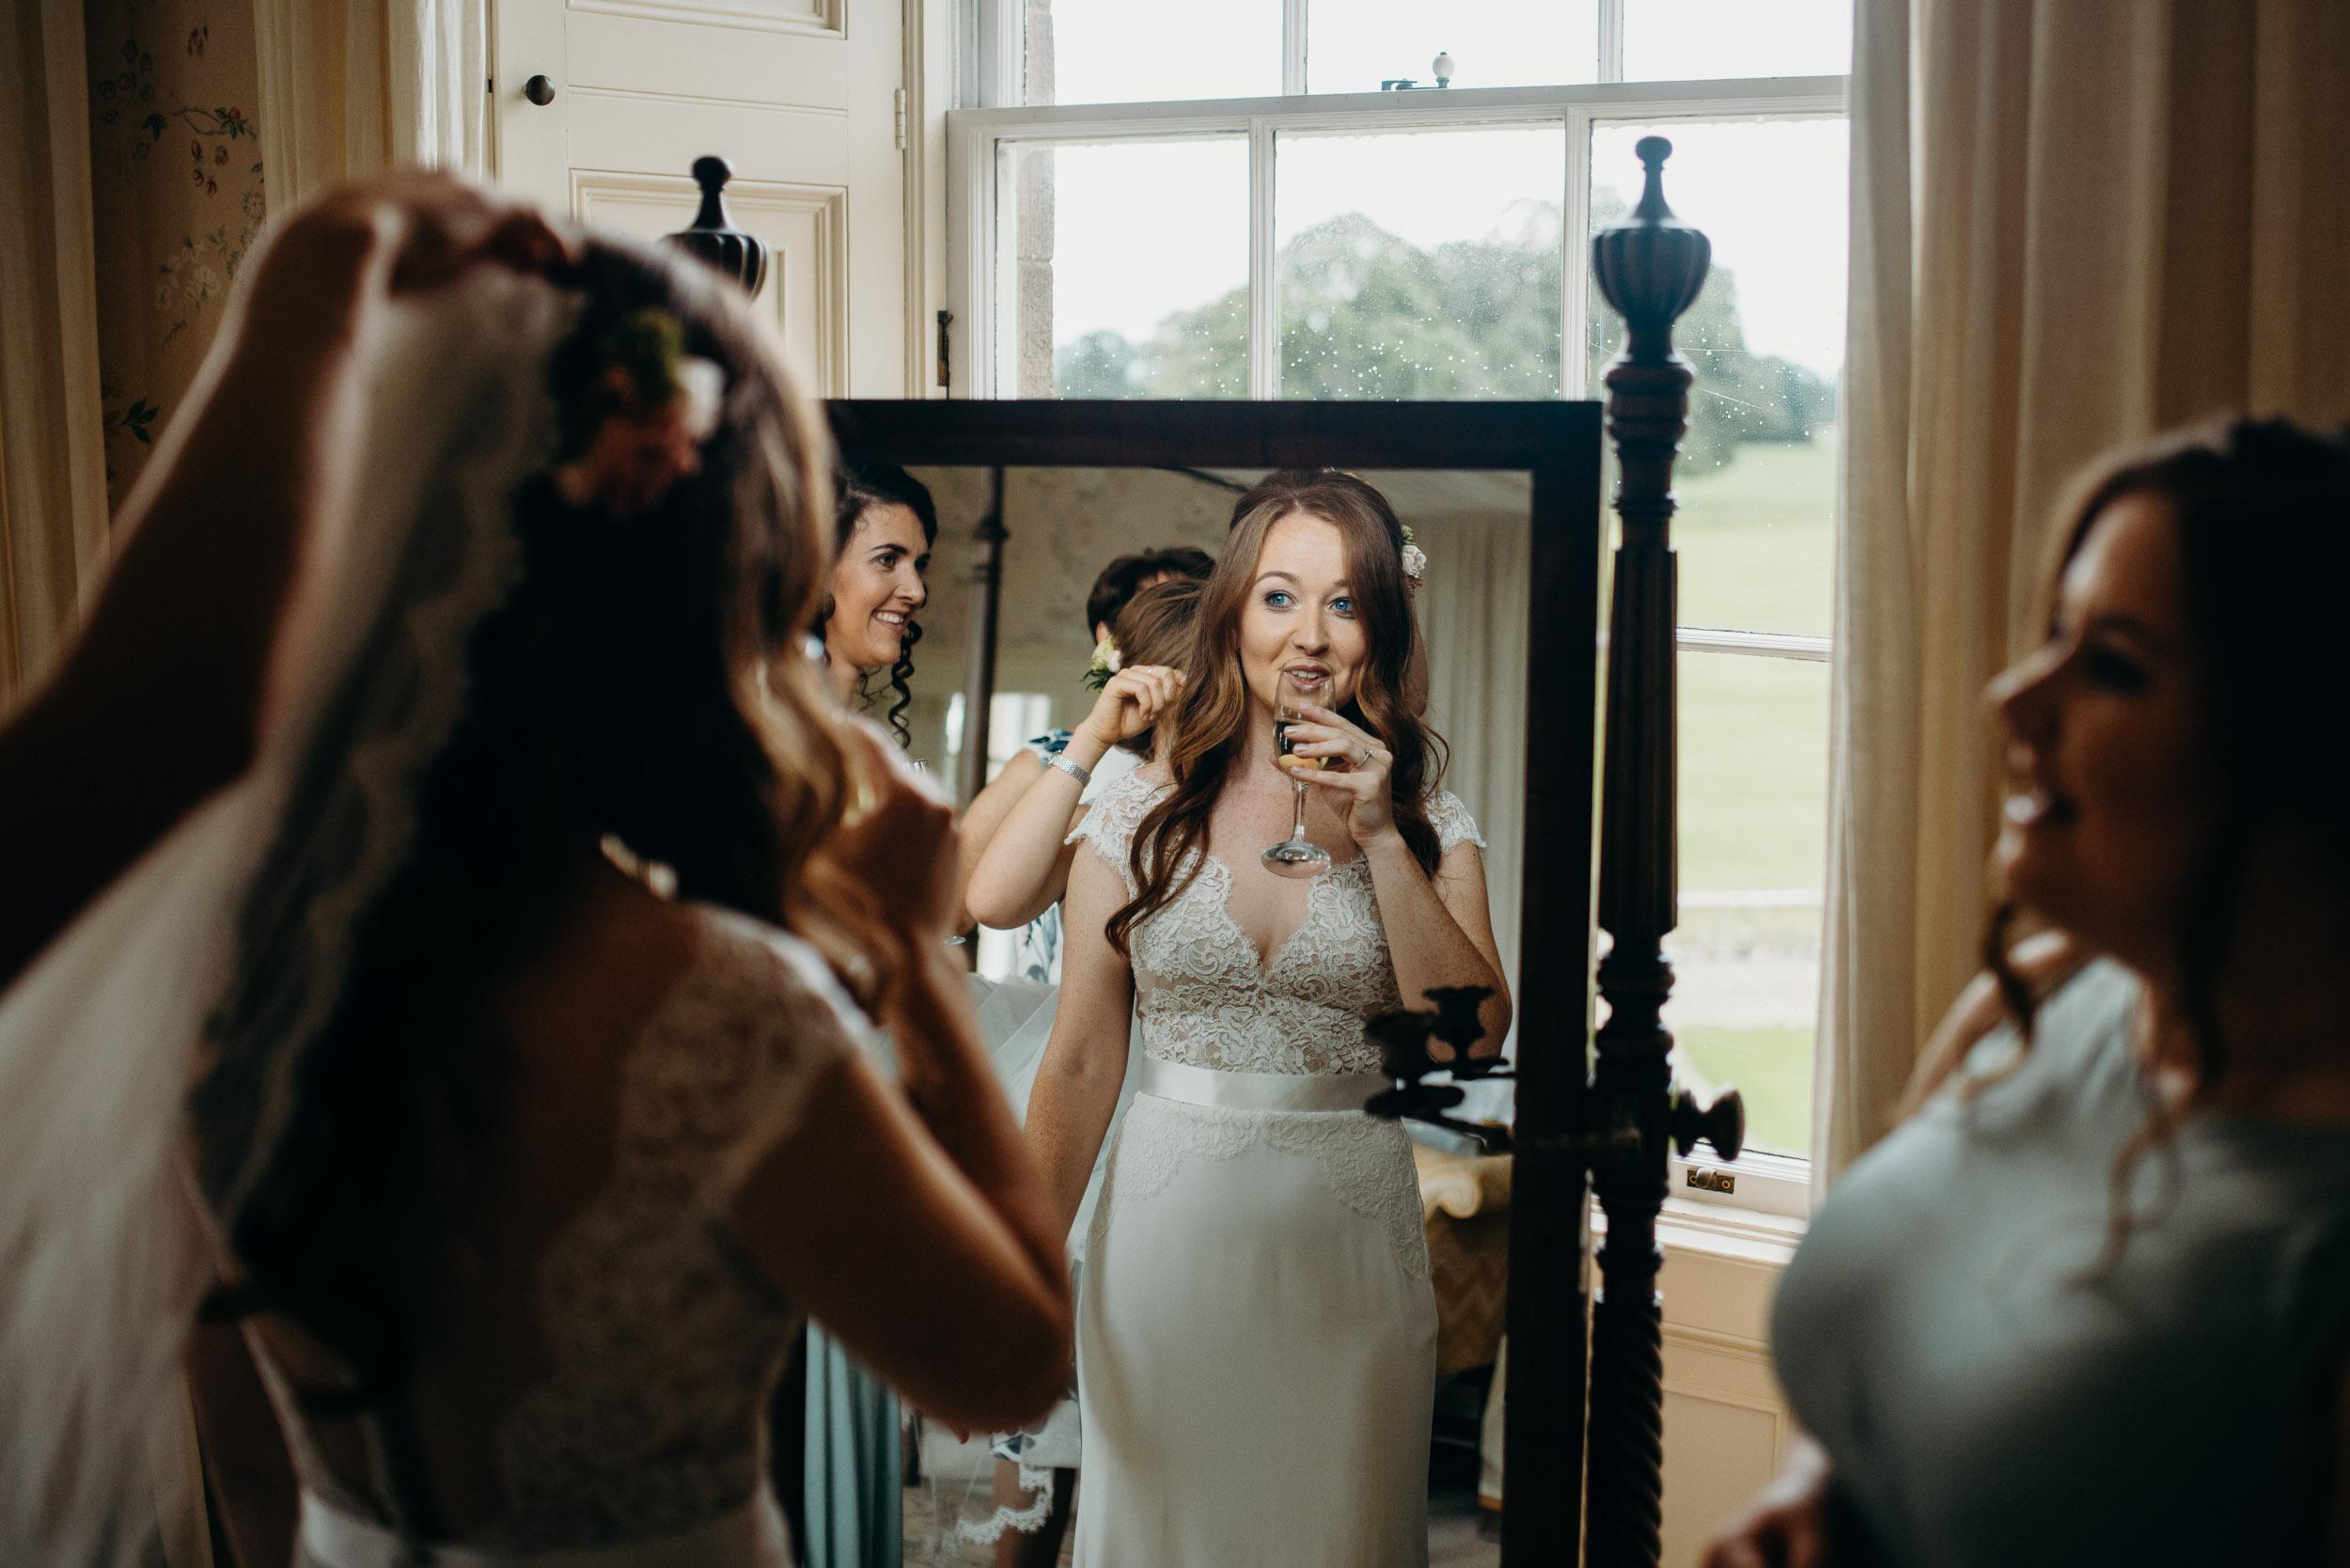 drenagh estate wedding photography-25.jpg